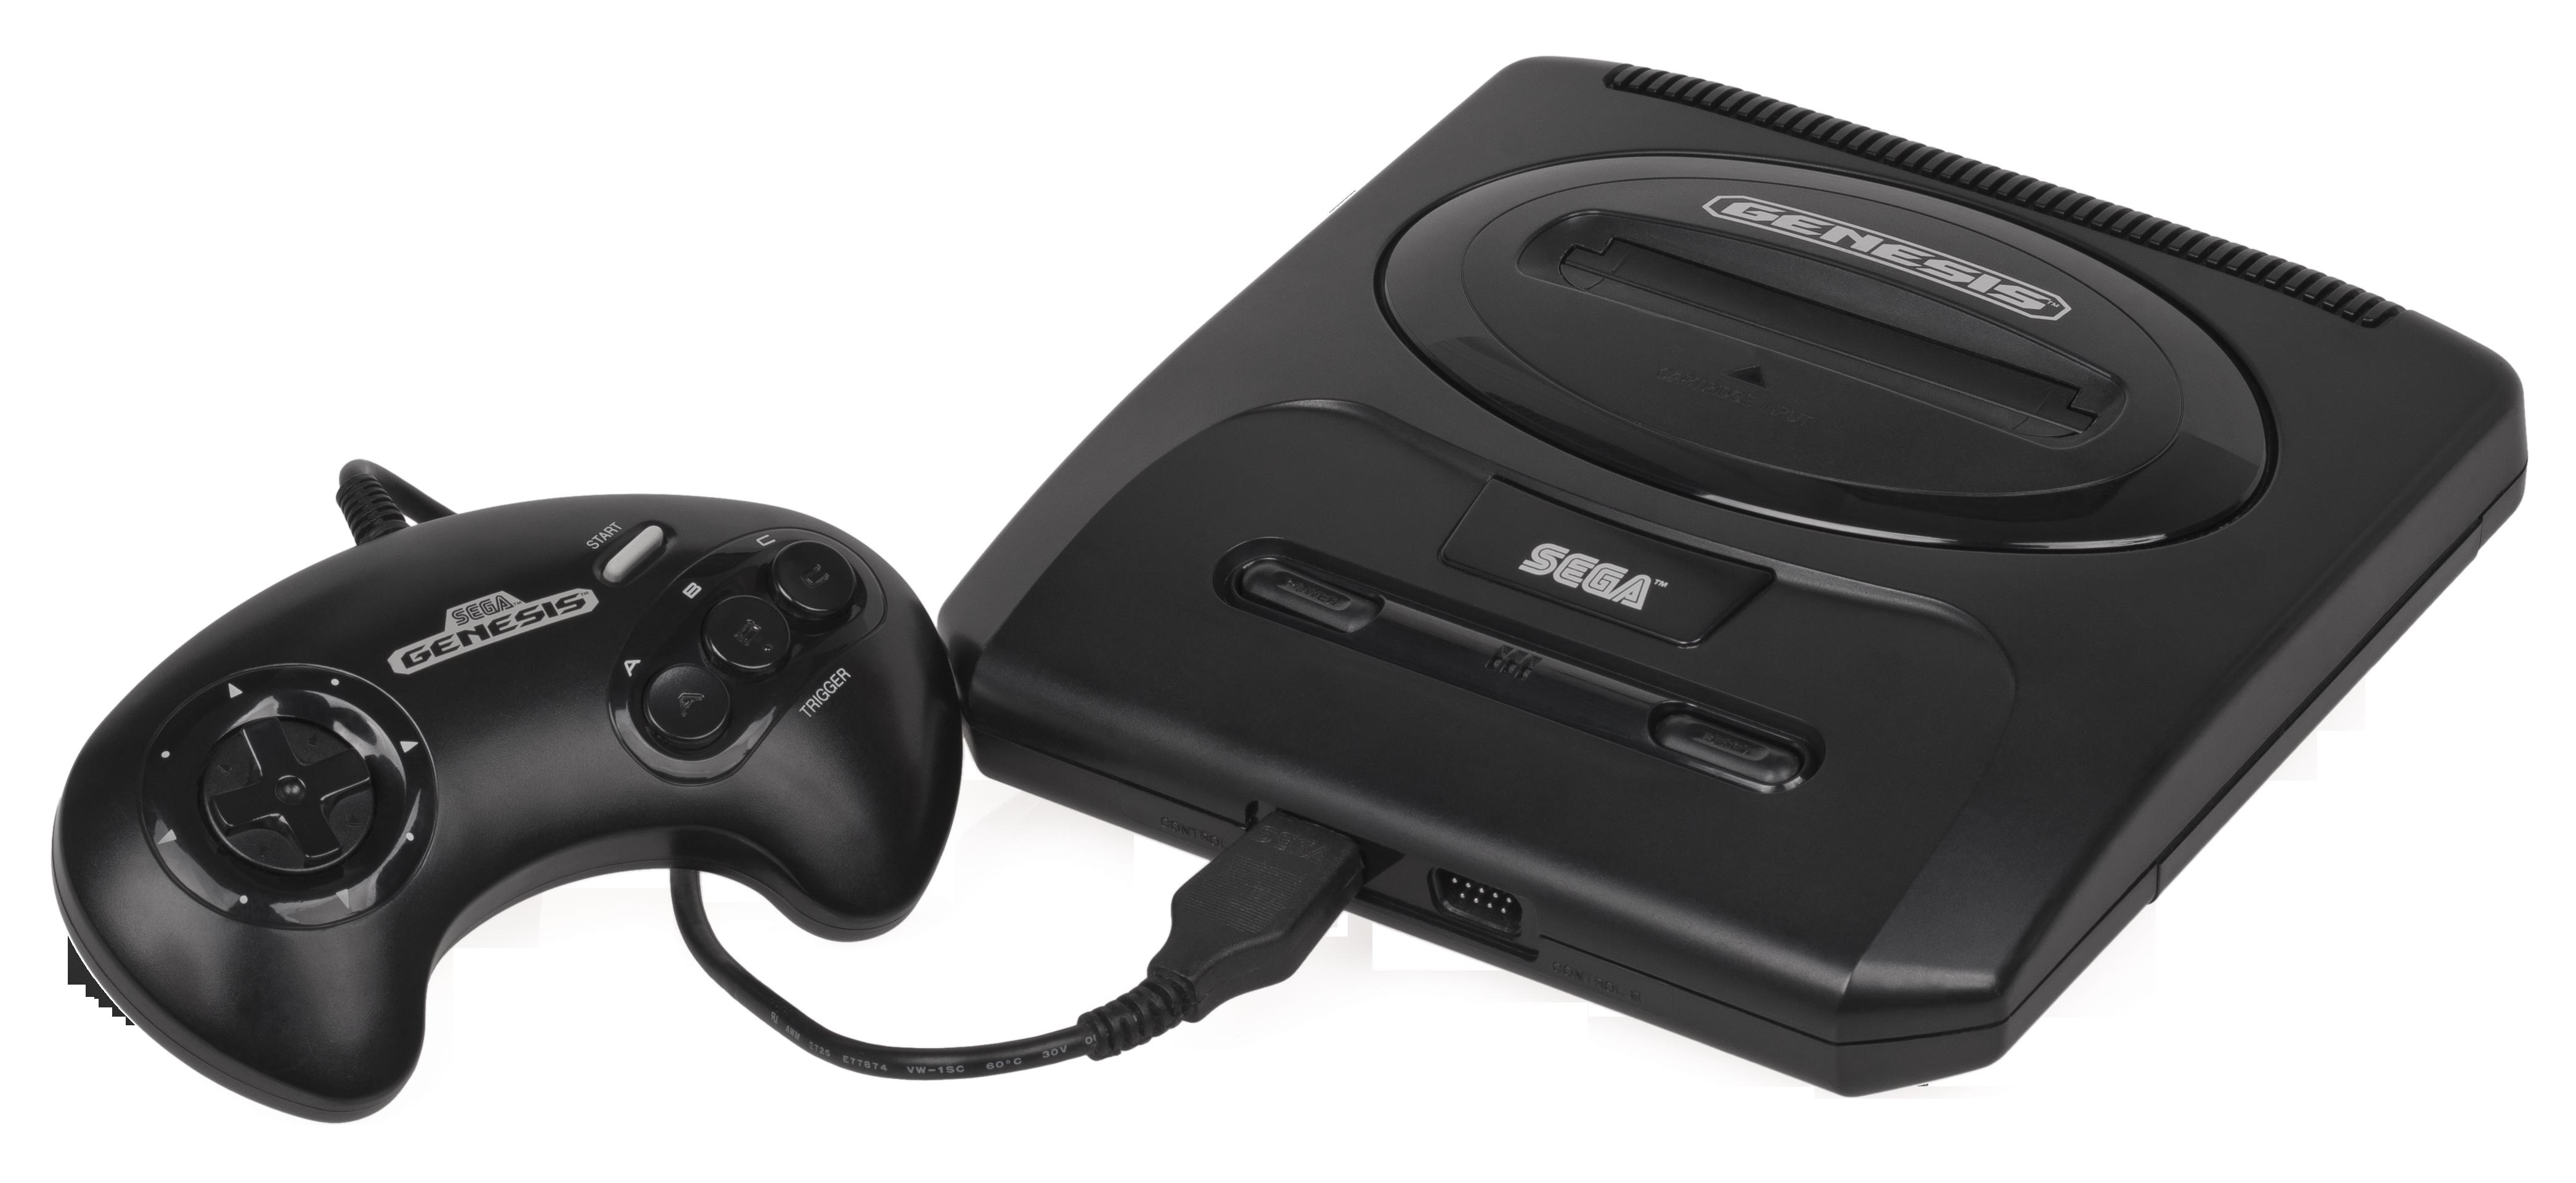 Sega Genesis So Many Late Nights Just Me And My Sega Z Sega Genesis Sega Sega Genesis Games